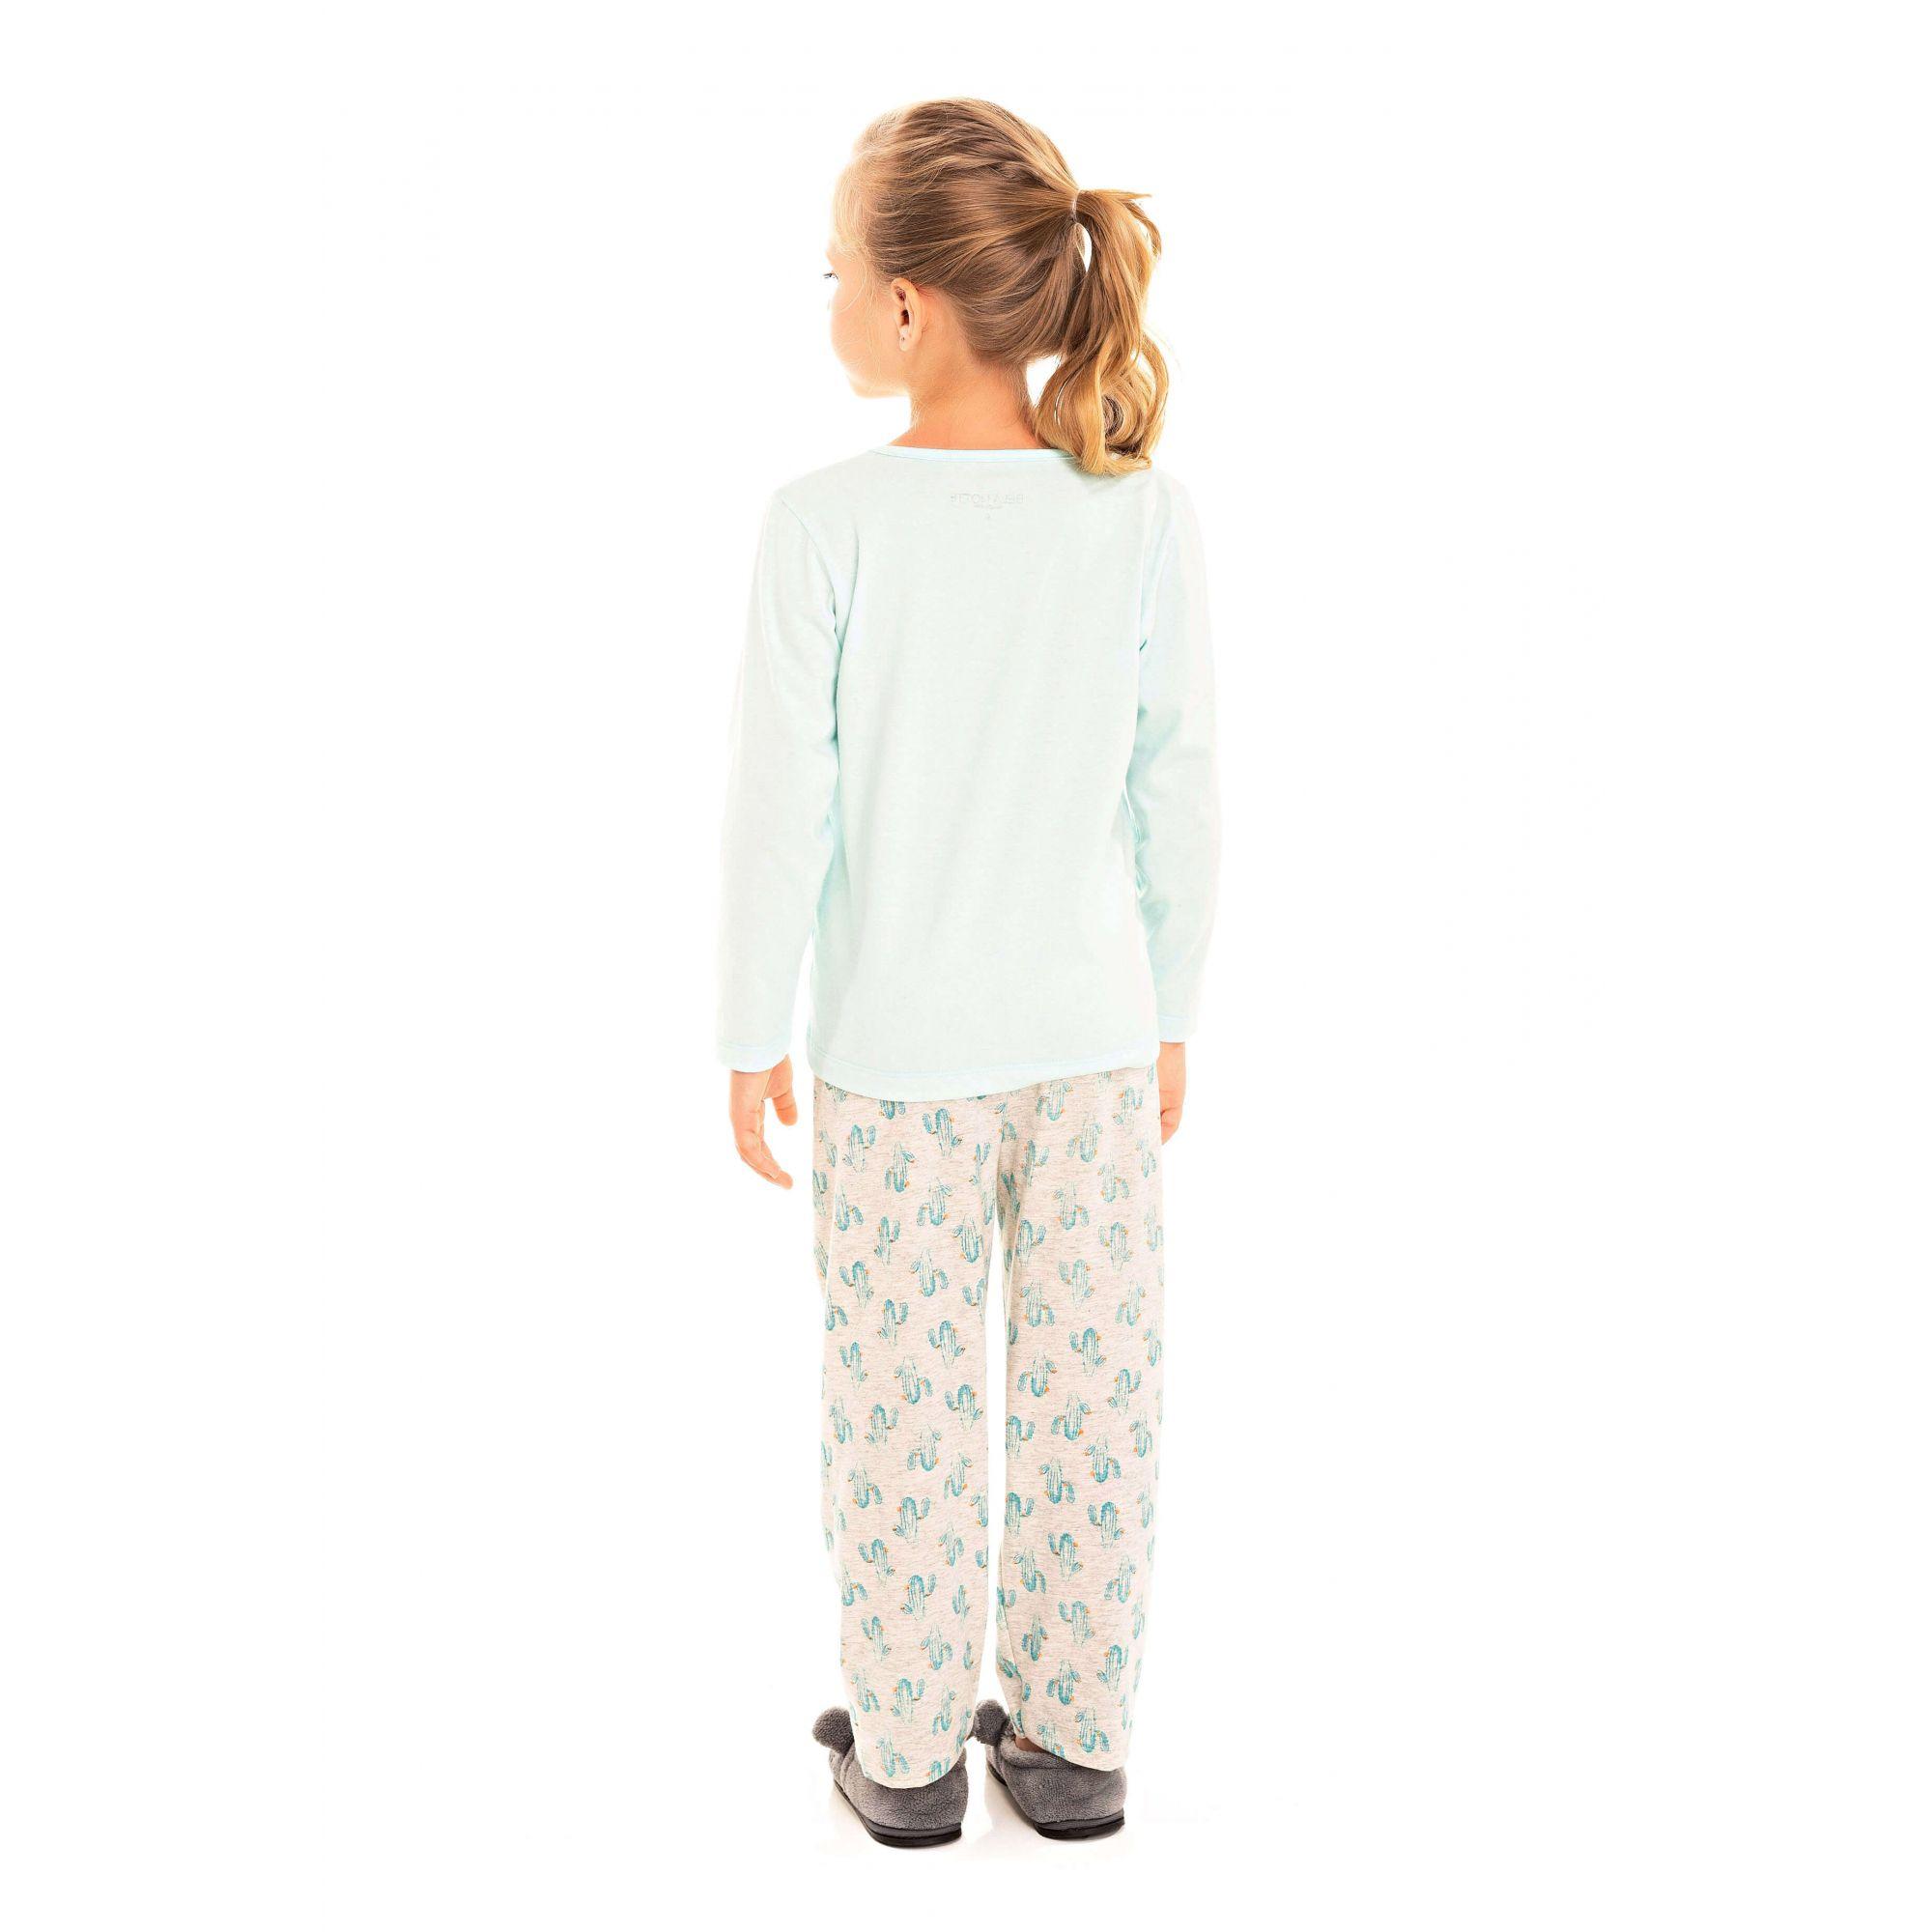 098/C - Pijama Infantil Feminino Belita Old West